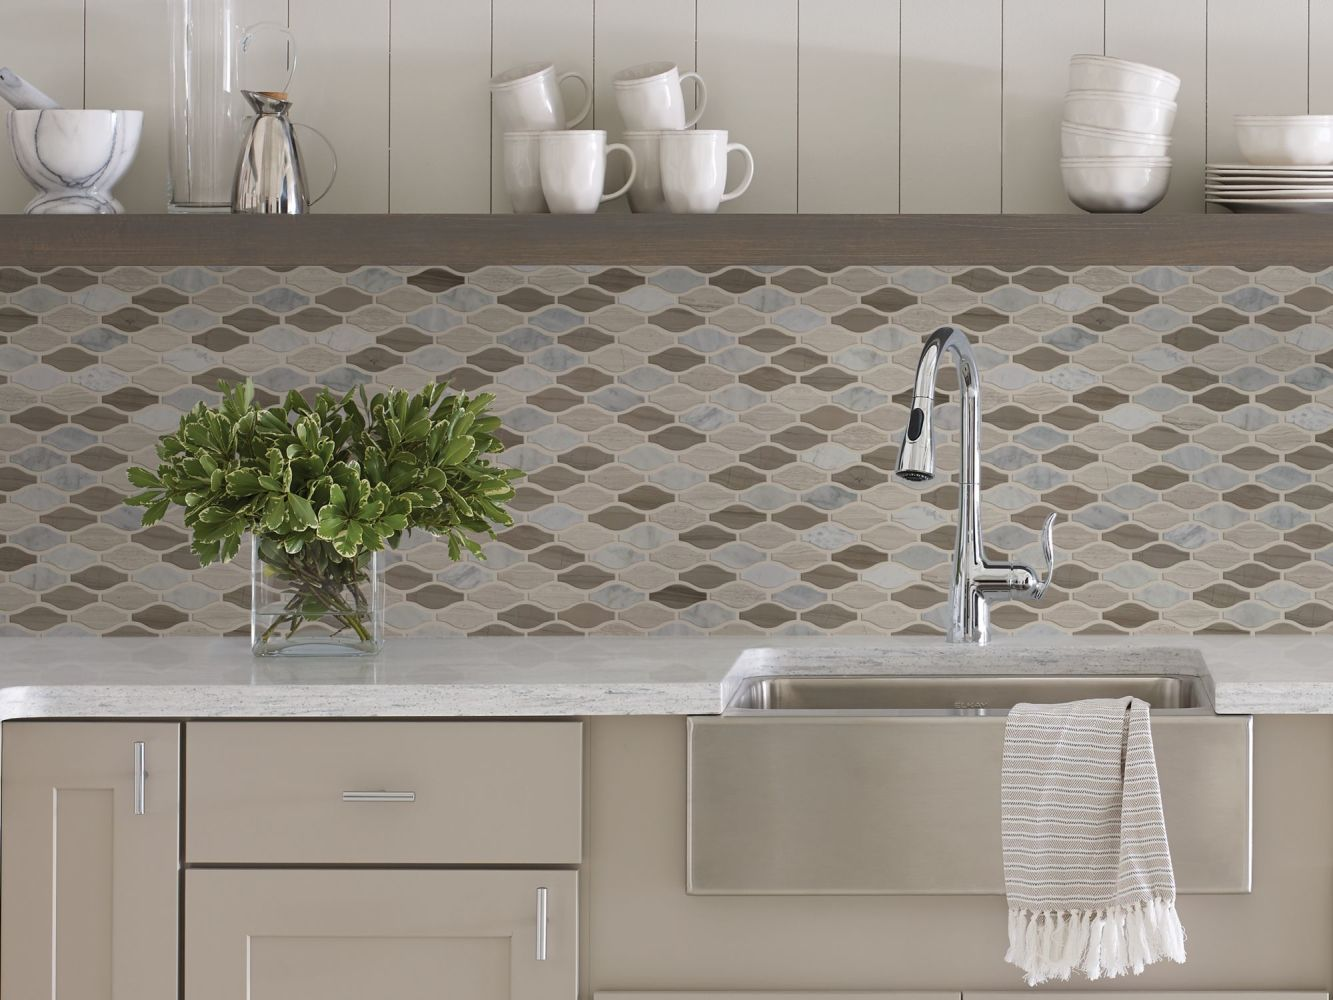 Shaw Floors Home Fn Gold Ceramic Estate Ornt Mo Bianco C Rockw Urba 00125_TG89B